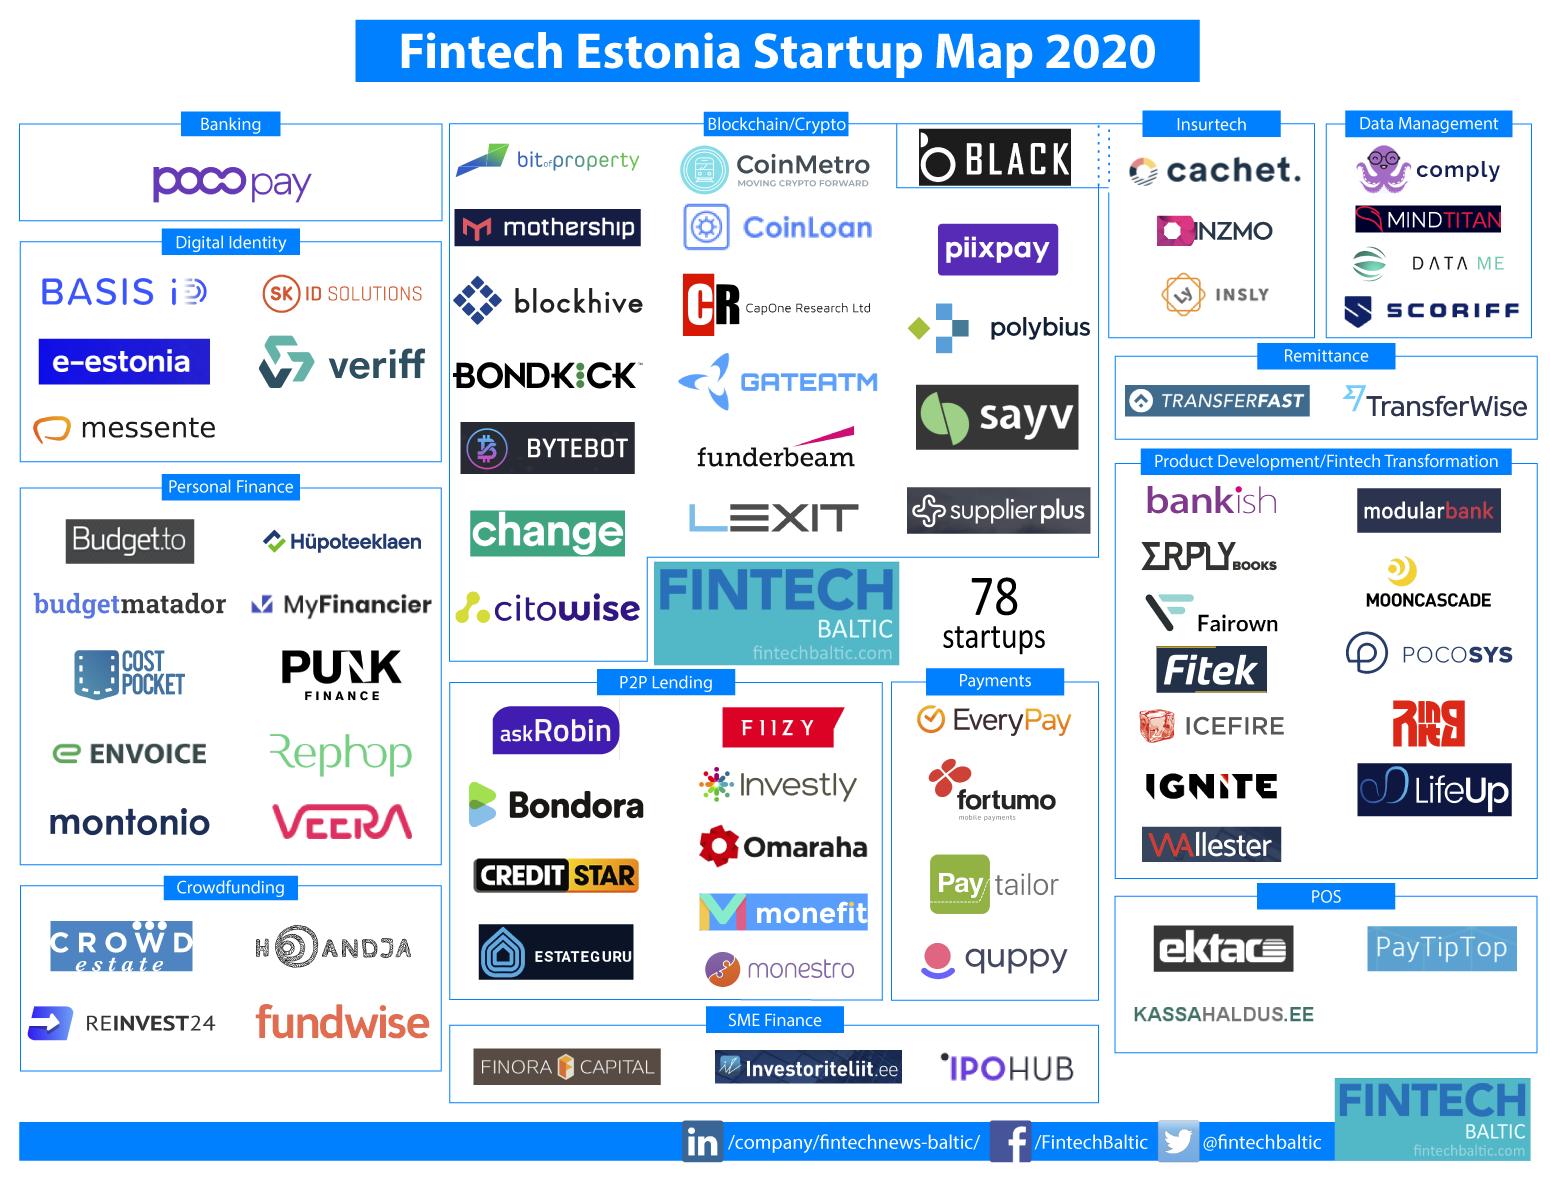 Estonia Fintech Startup Map 2020